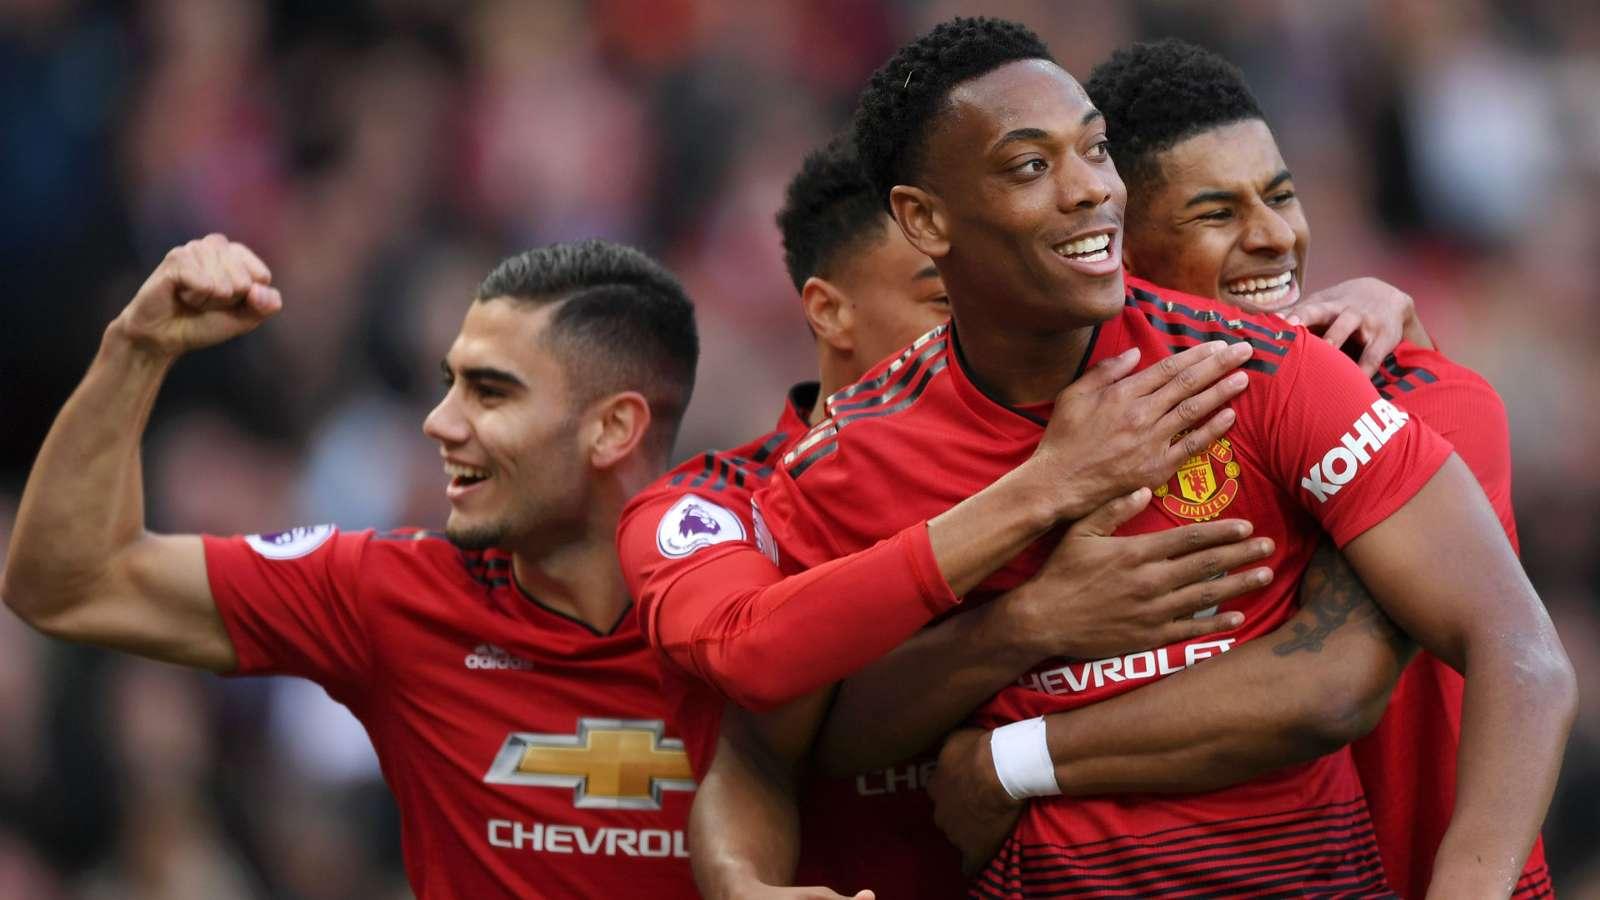 Manchester United-Watford 2-1, Martial et MU font le travail